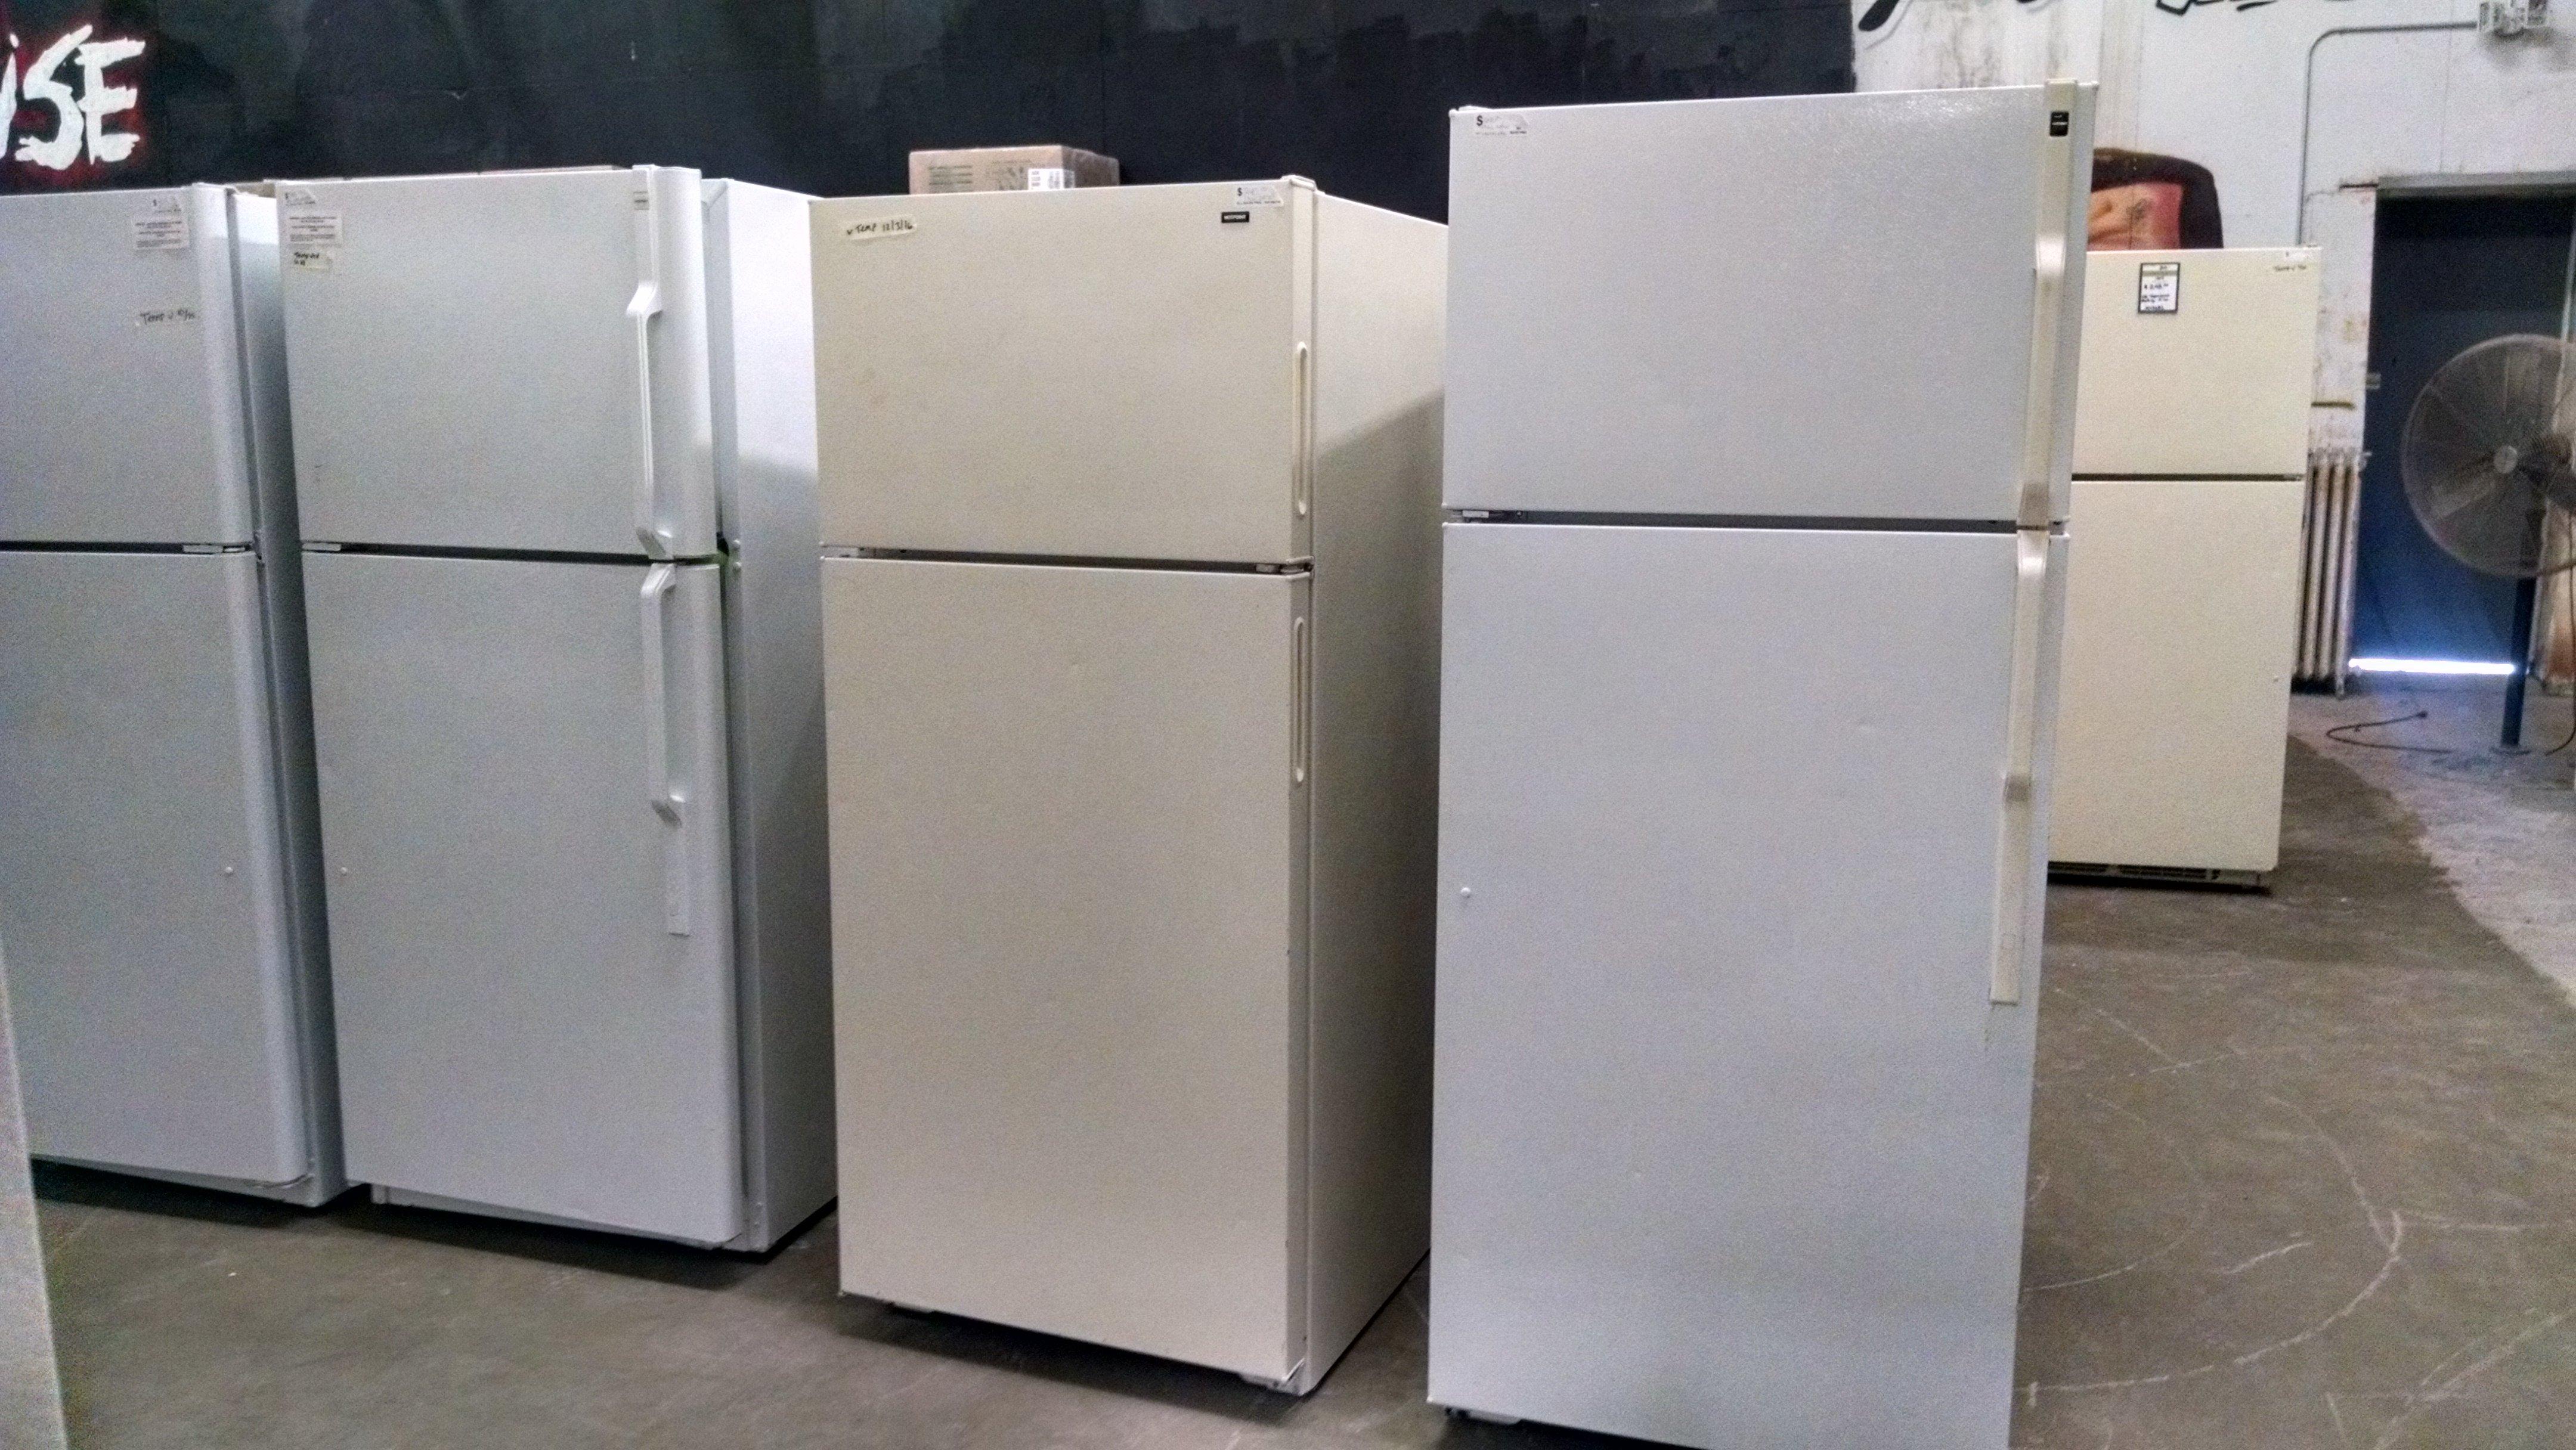 Topmount refrigerators